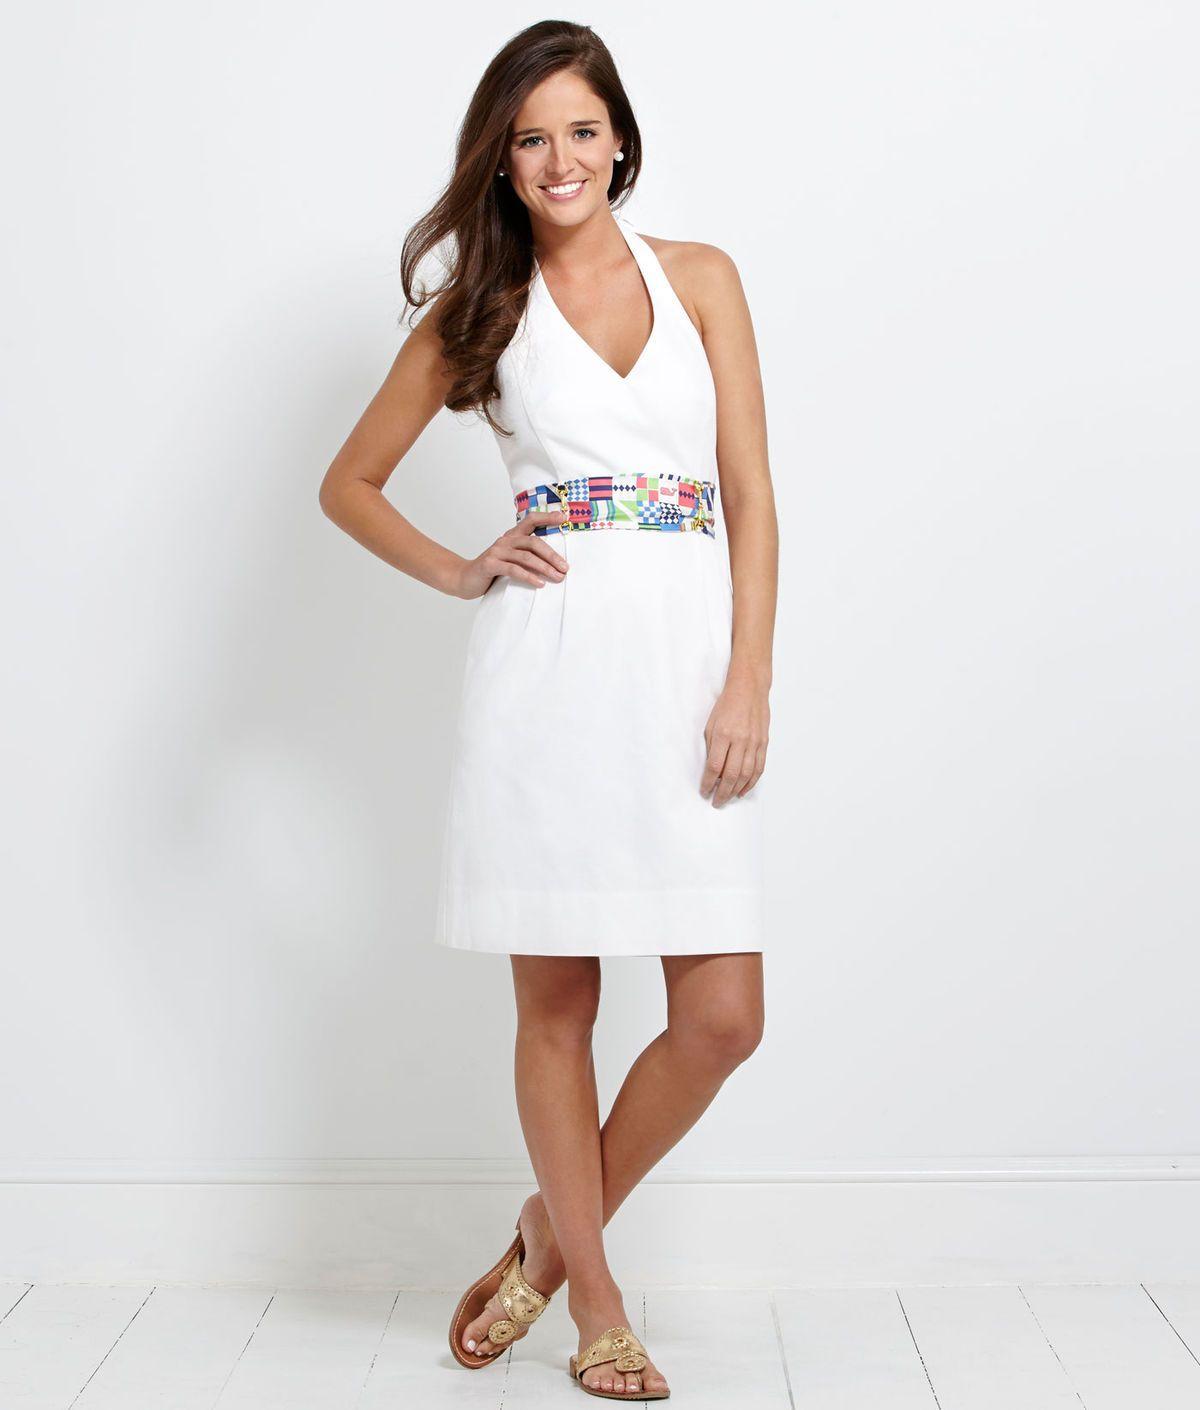 Women's Dresses: Derby Sash Halter Dress for Kentucky Derby